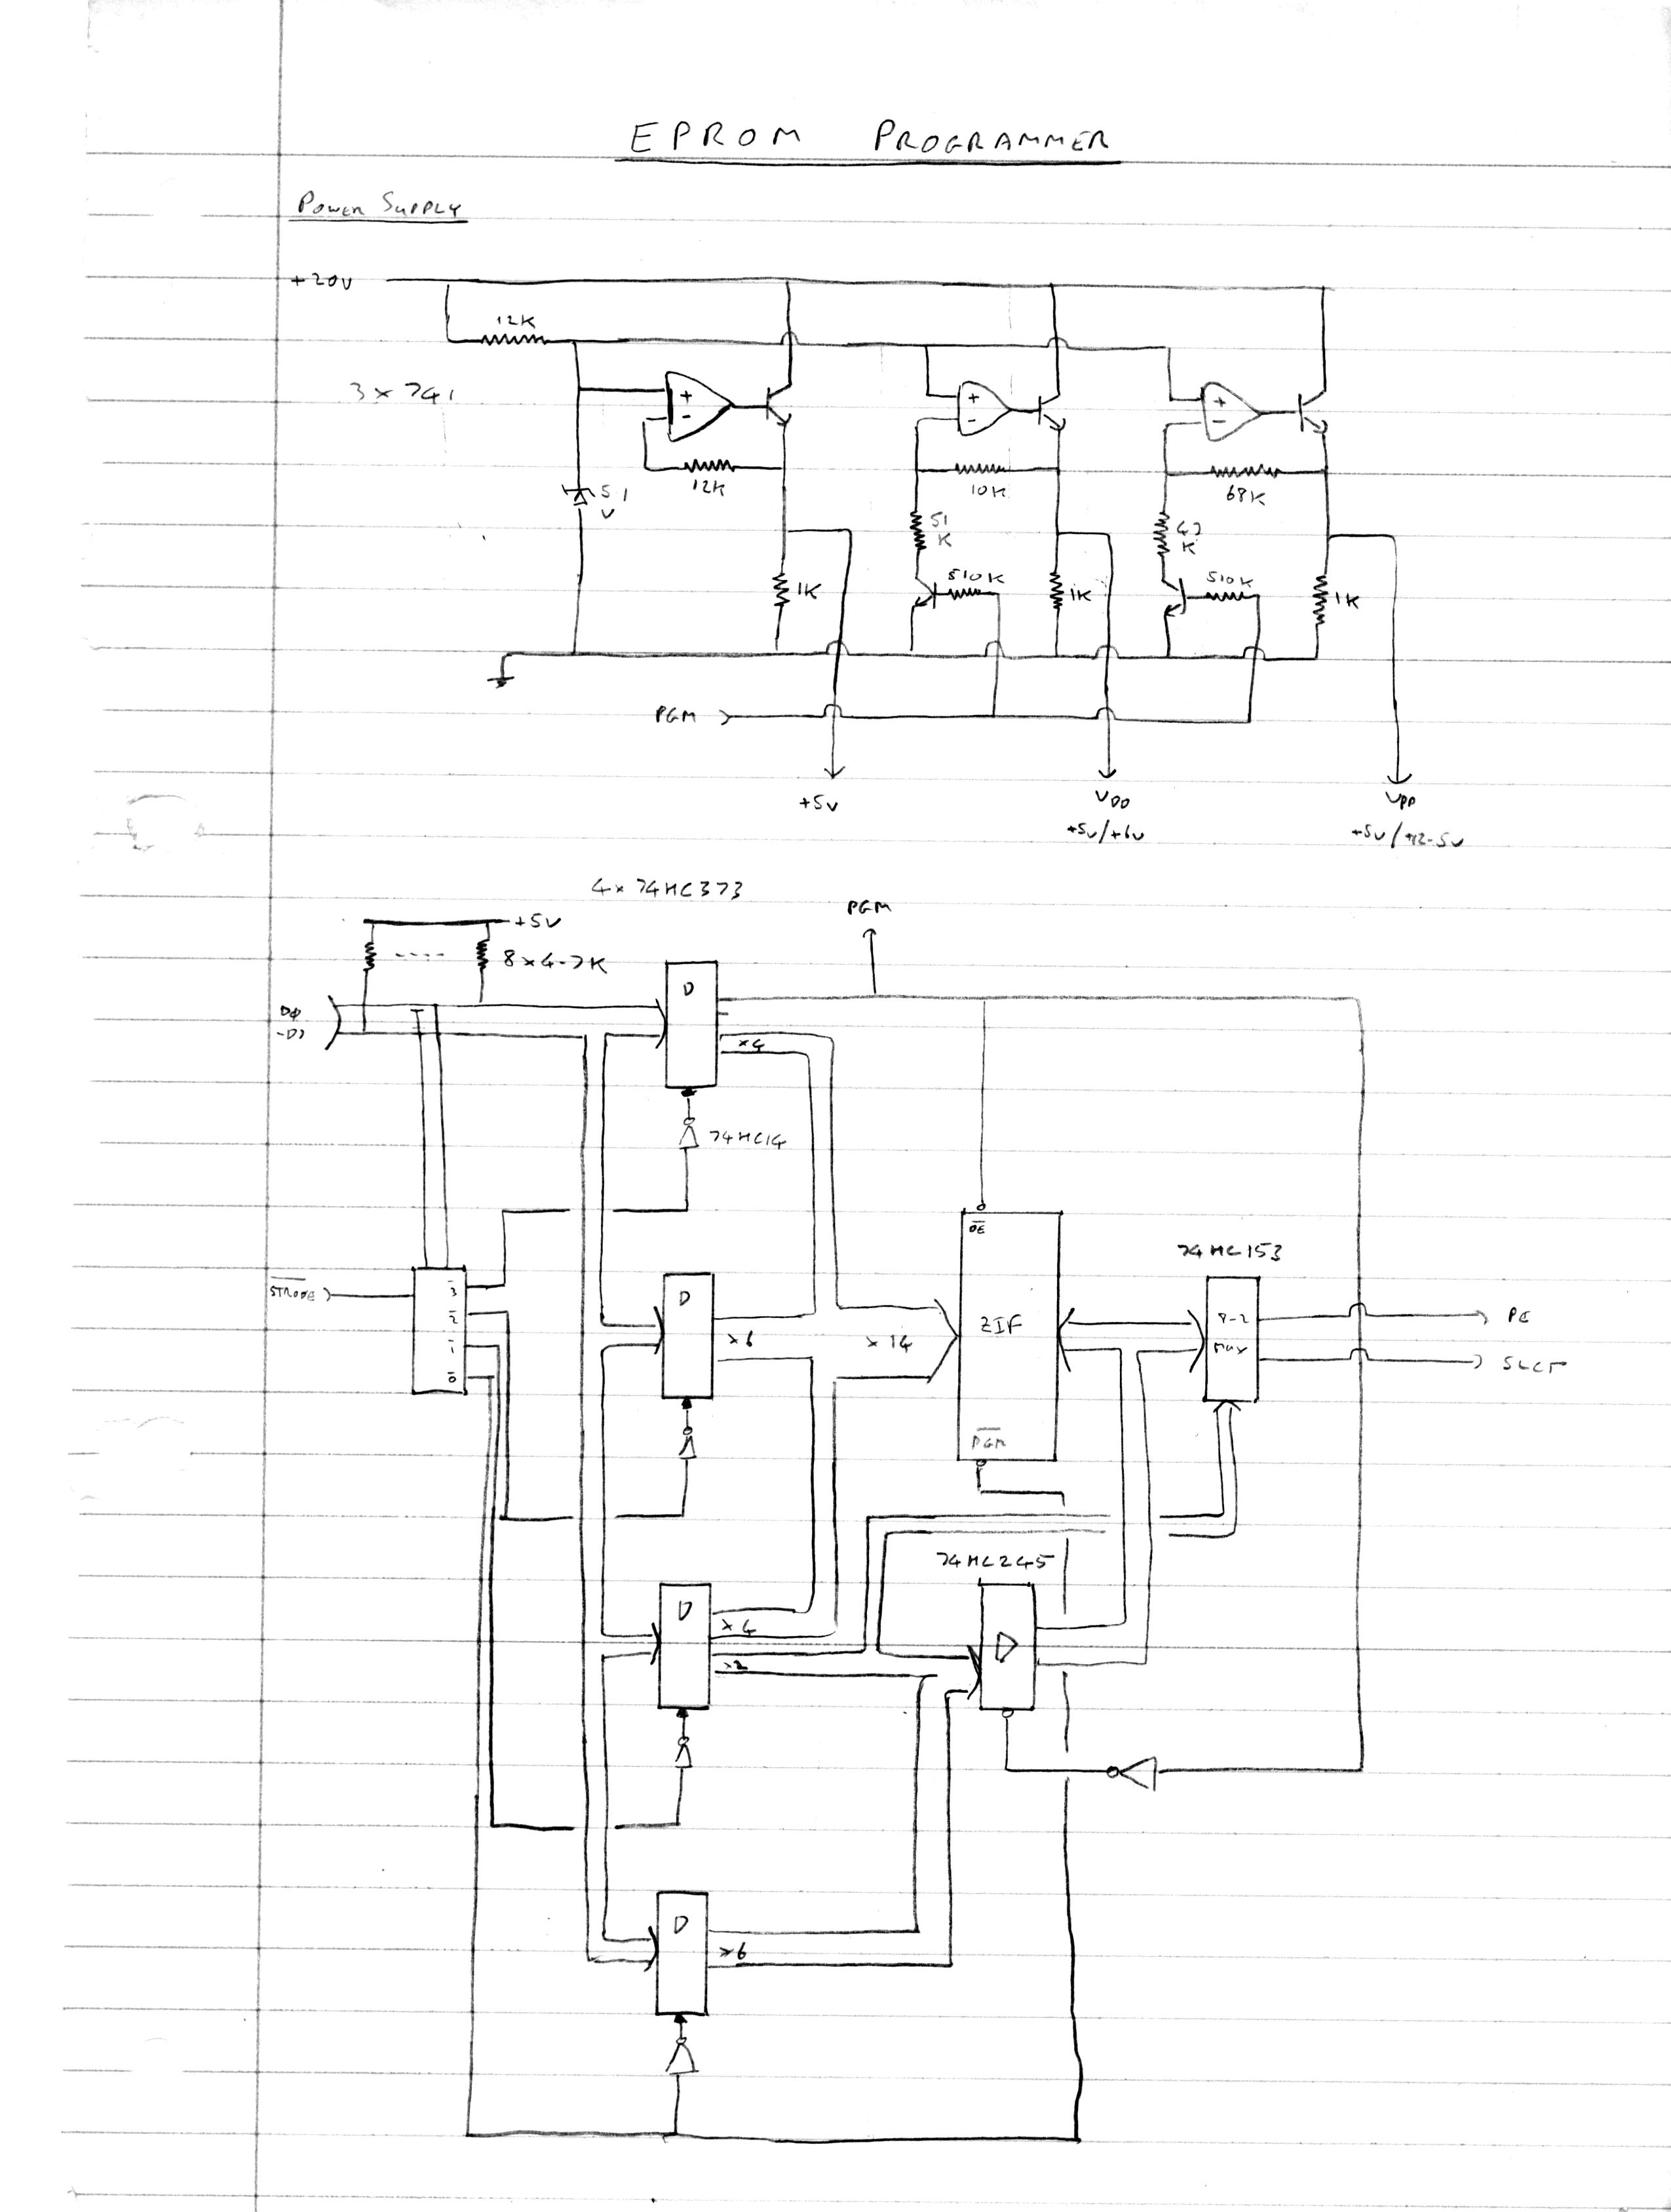 Memotech MTX 512 - Projects : EPROM Programmer